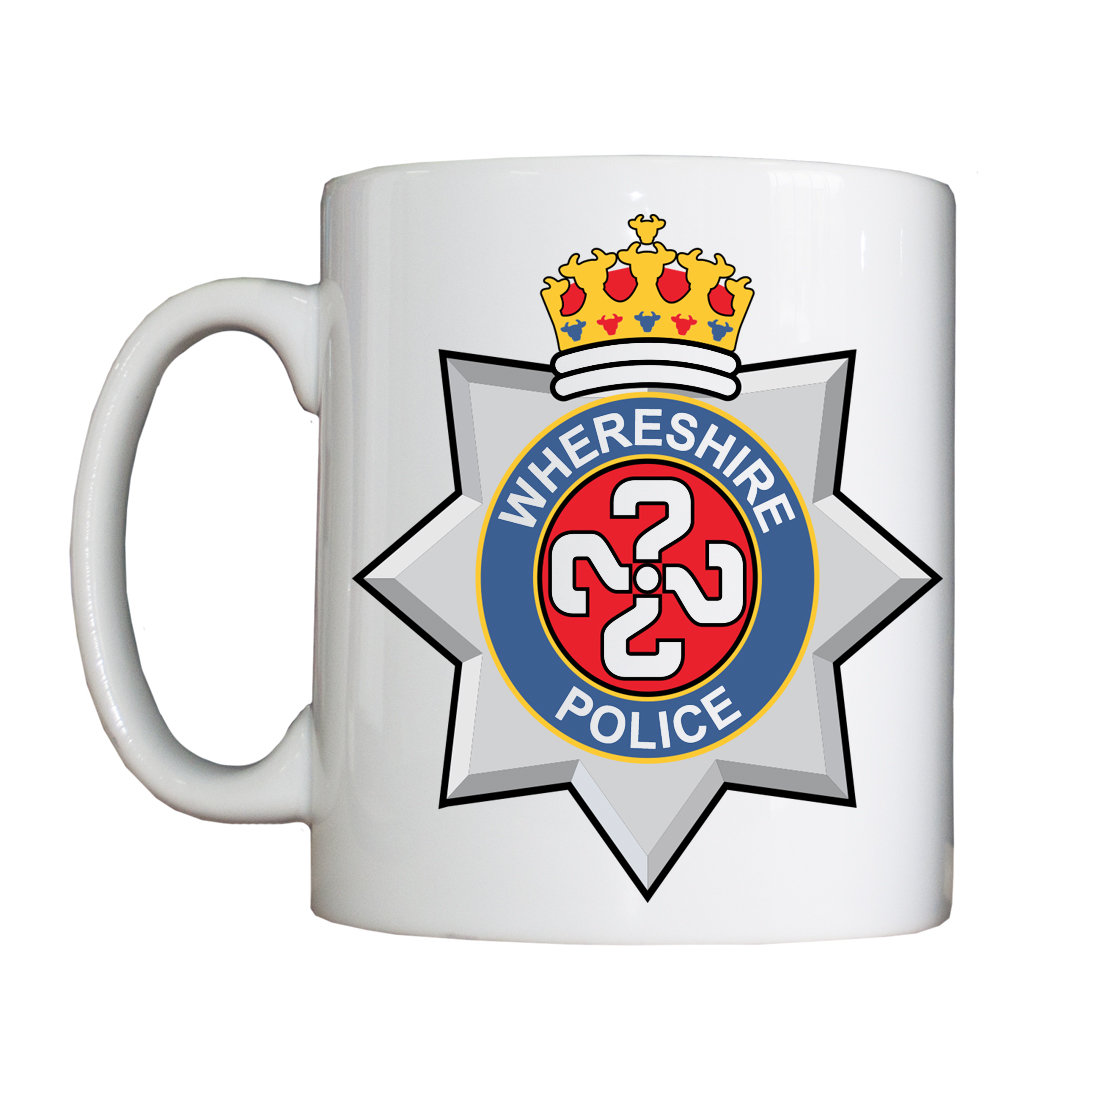 Personalised 'Whereshire' Mug WhereshireMug